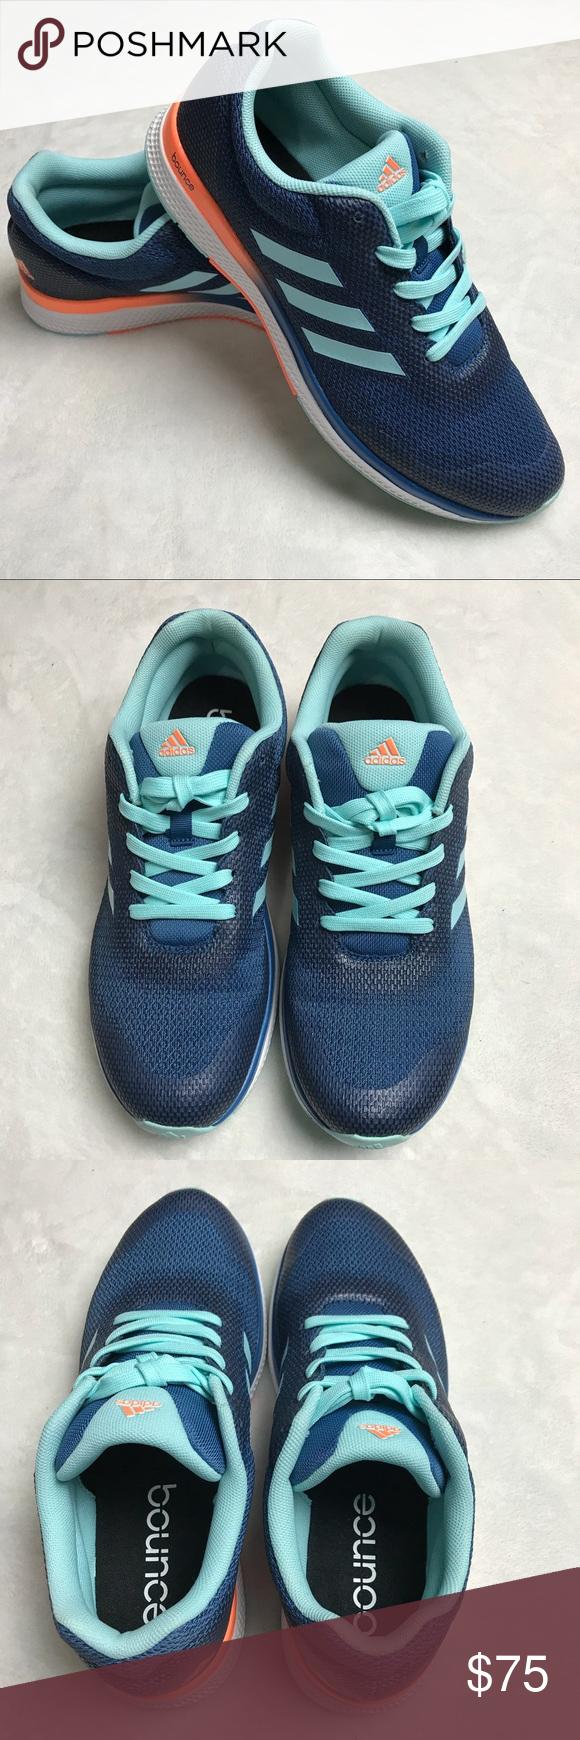 1e703b7fc adidas Mana Bounce 2.0 W Aramis II Navy Blue Shoes adidas Mana Bounce 2.0 W  Aramis